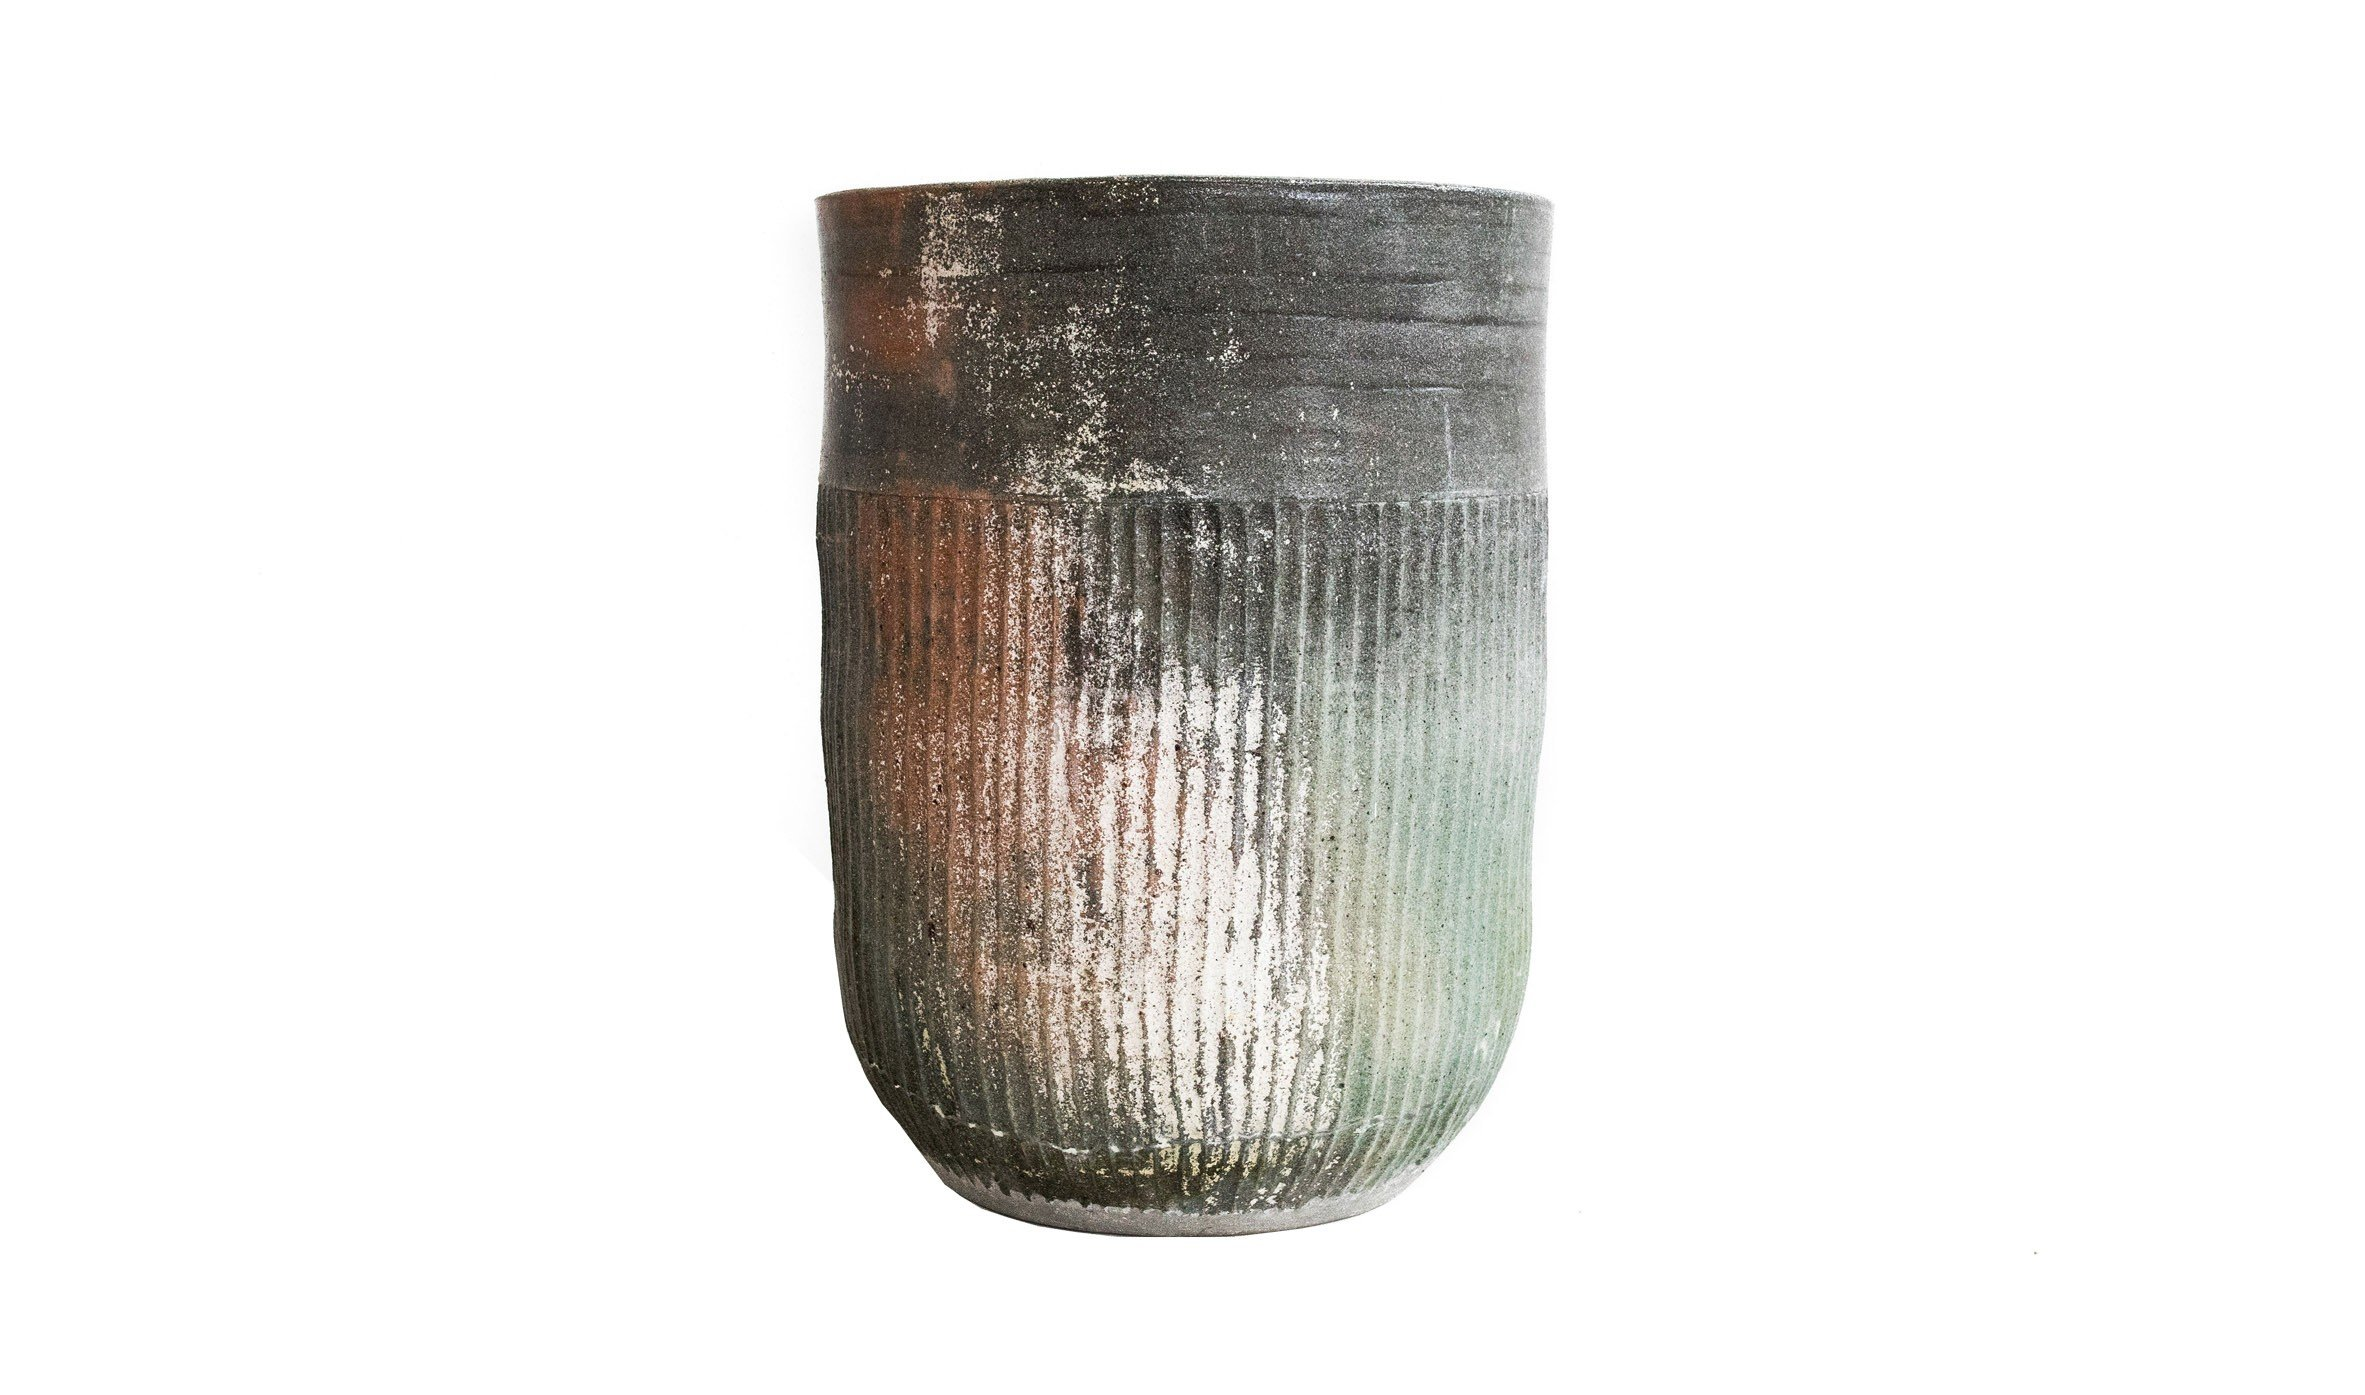 Decor Landare Thumbnails Banksia-Clay-Pot-Thumbnail-01